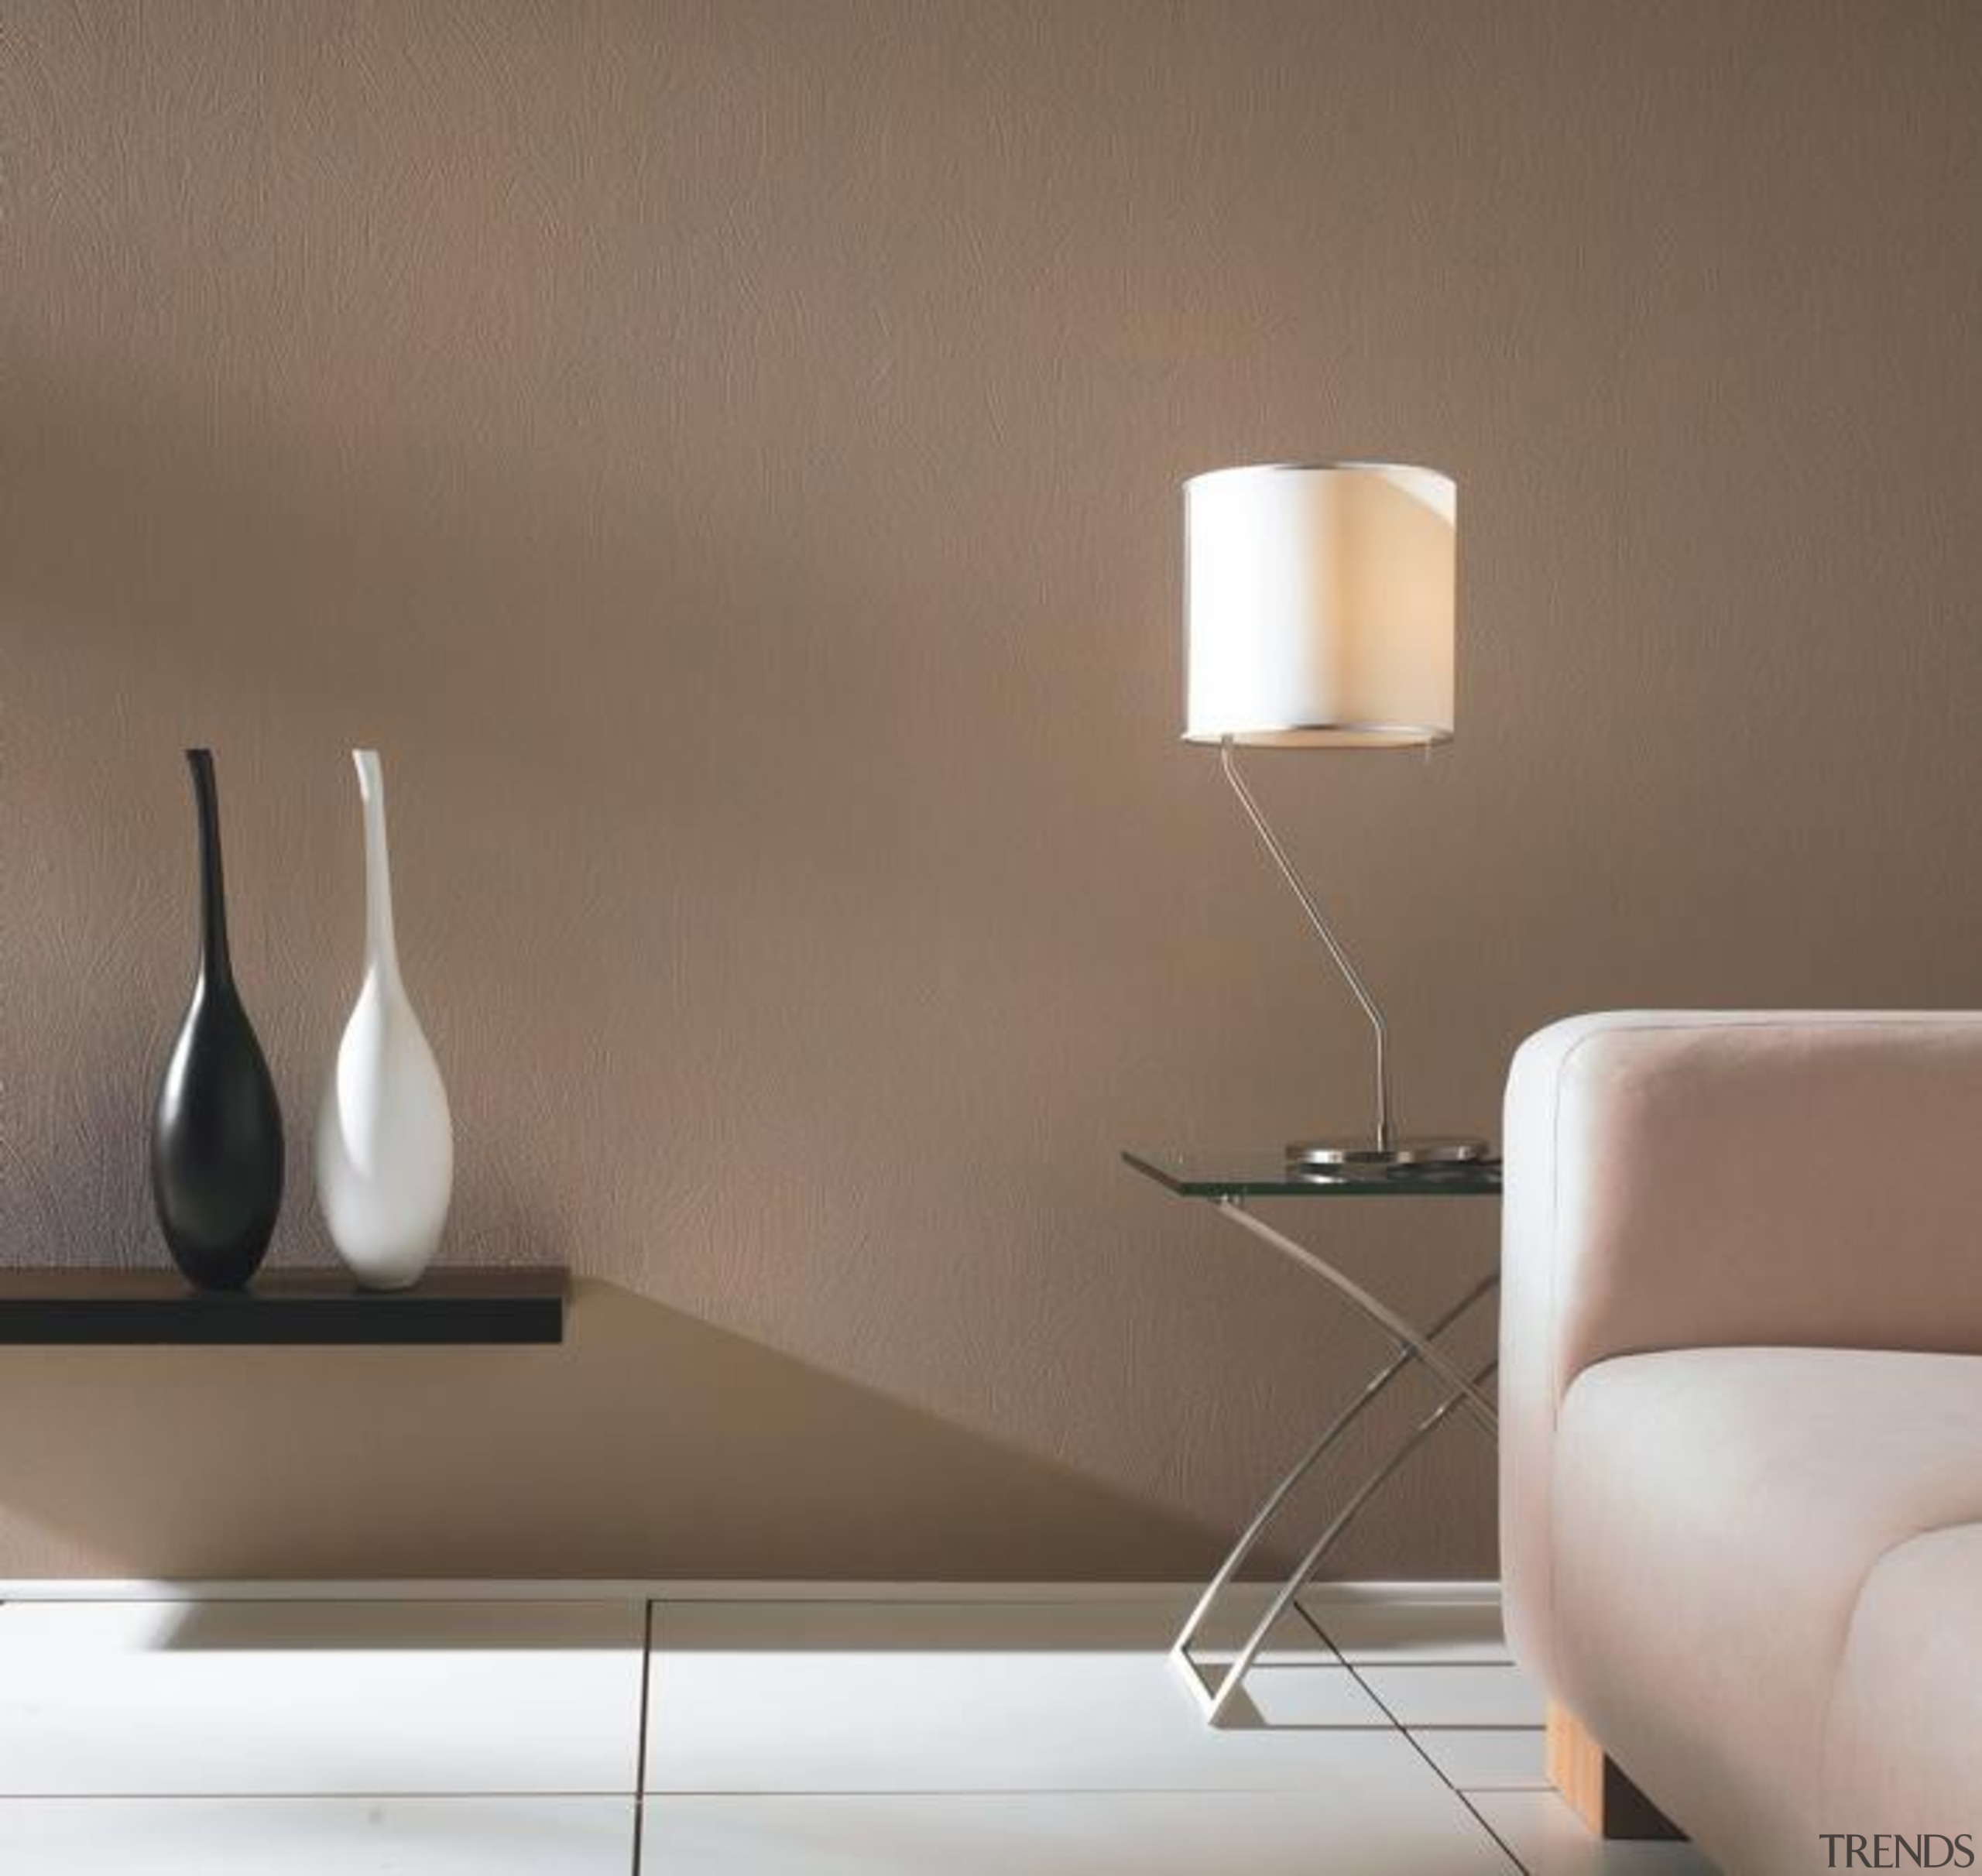 Wallton Painton Range - Wallton Painton Range - ceiling, floor, interior design, lamp, lampshade, light fixture, lighting, lighting accessory, product design, table, wall, brown